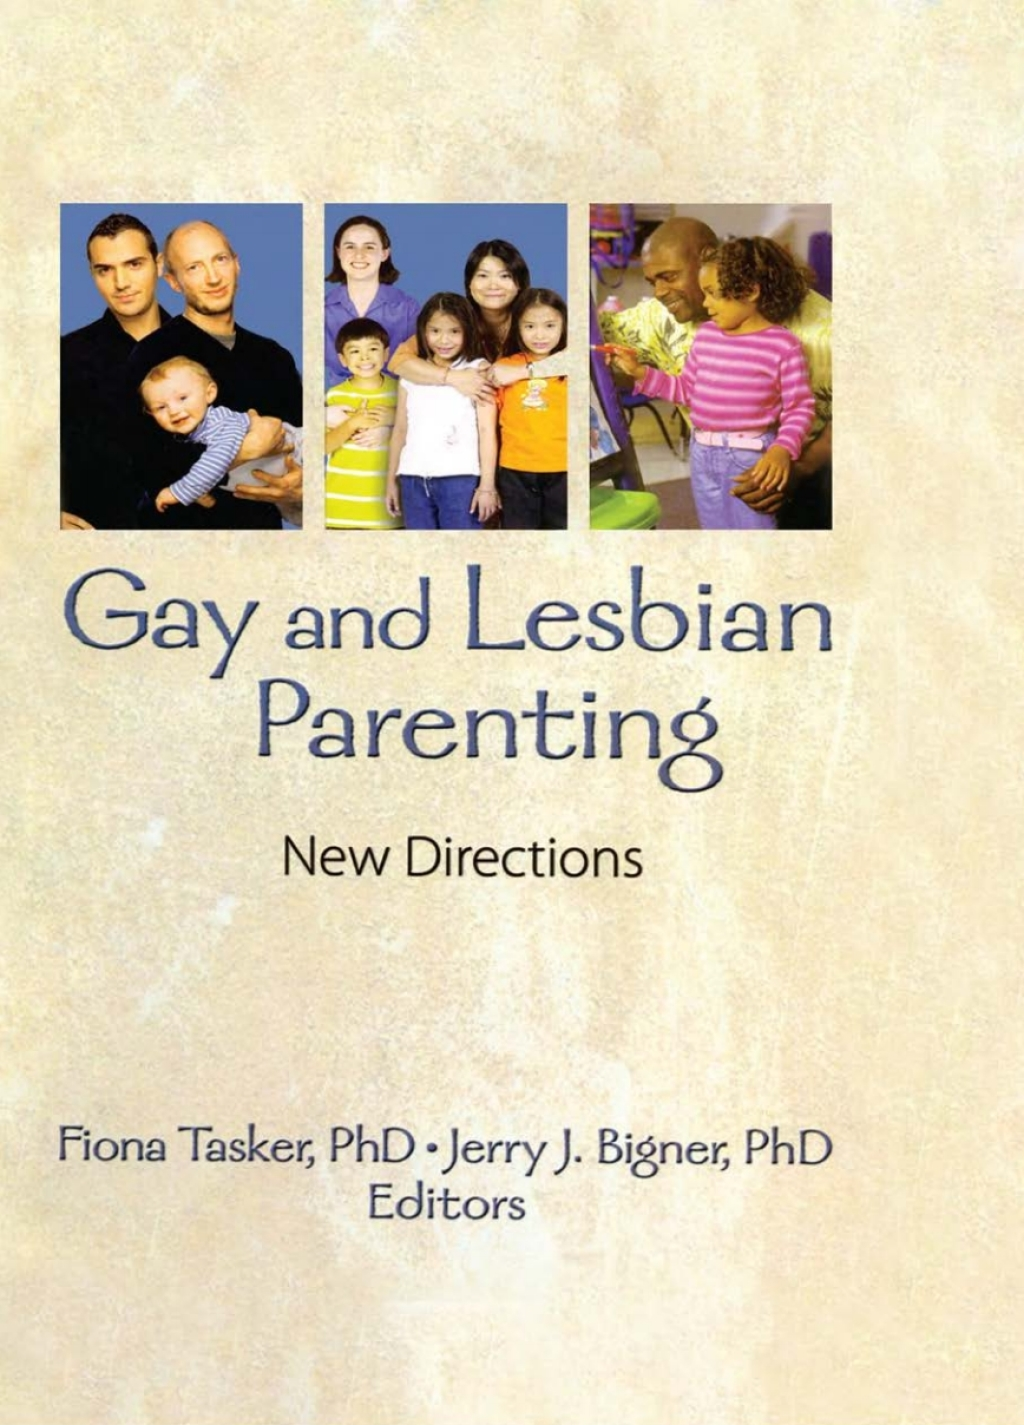 Gay and Lesbian Parenting (eBook Rental)